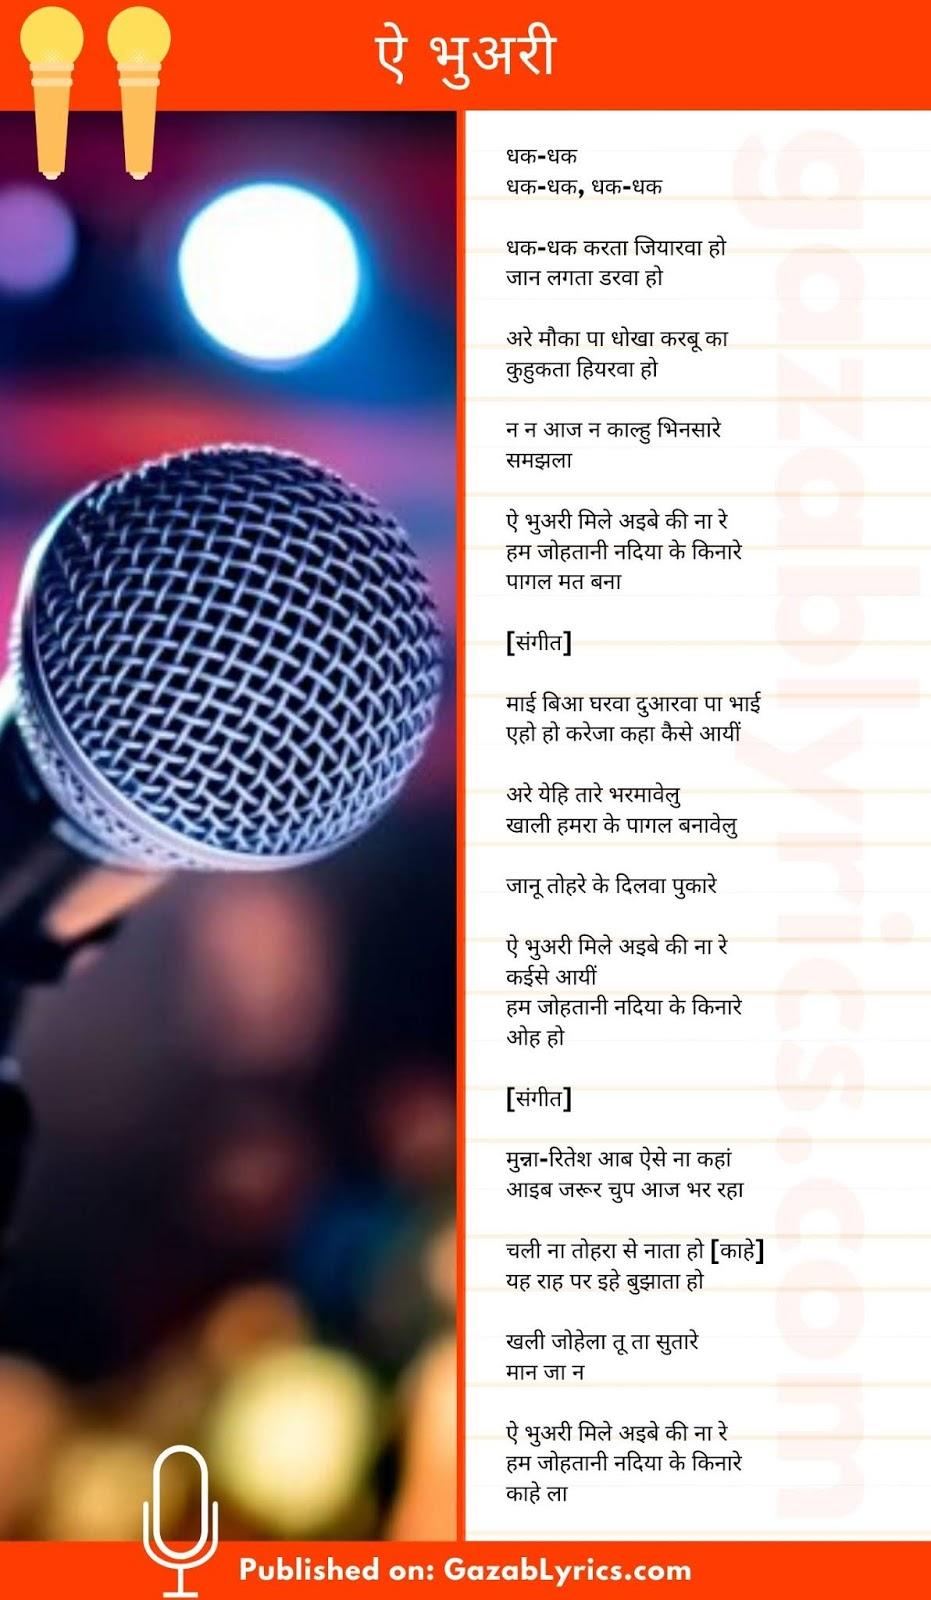 Ae Bhuari song lyrics image